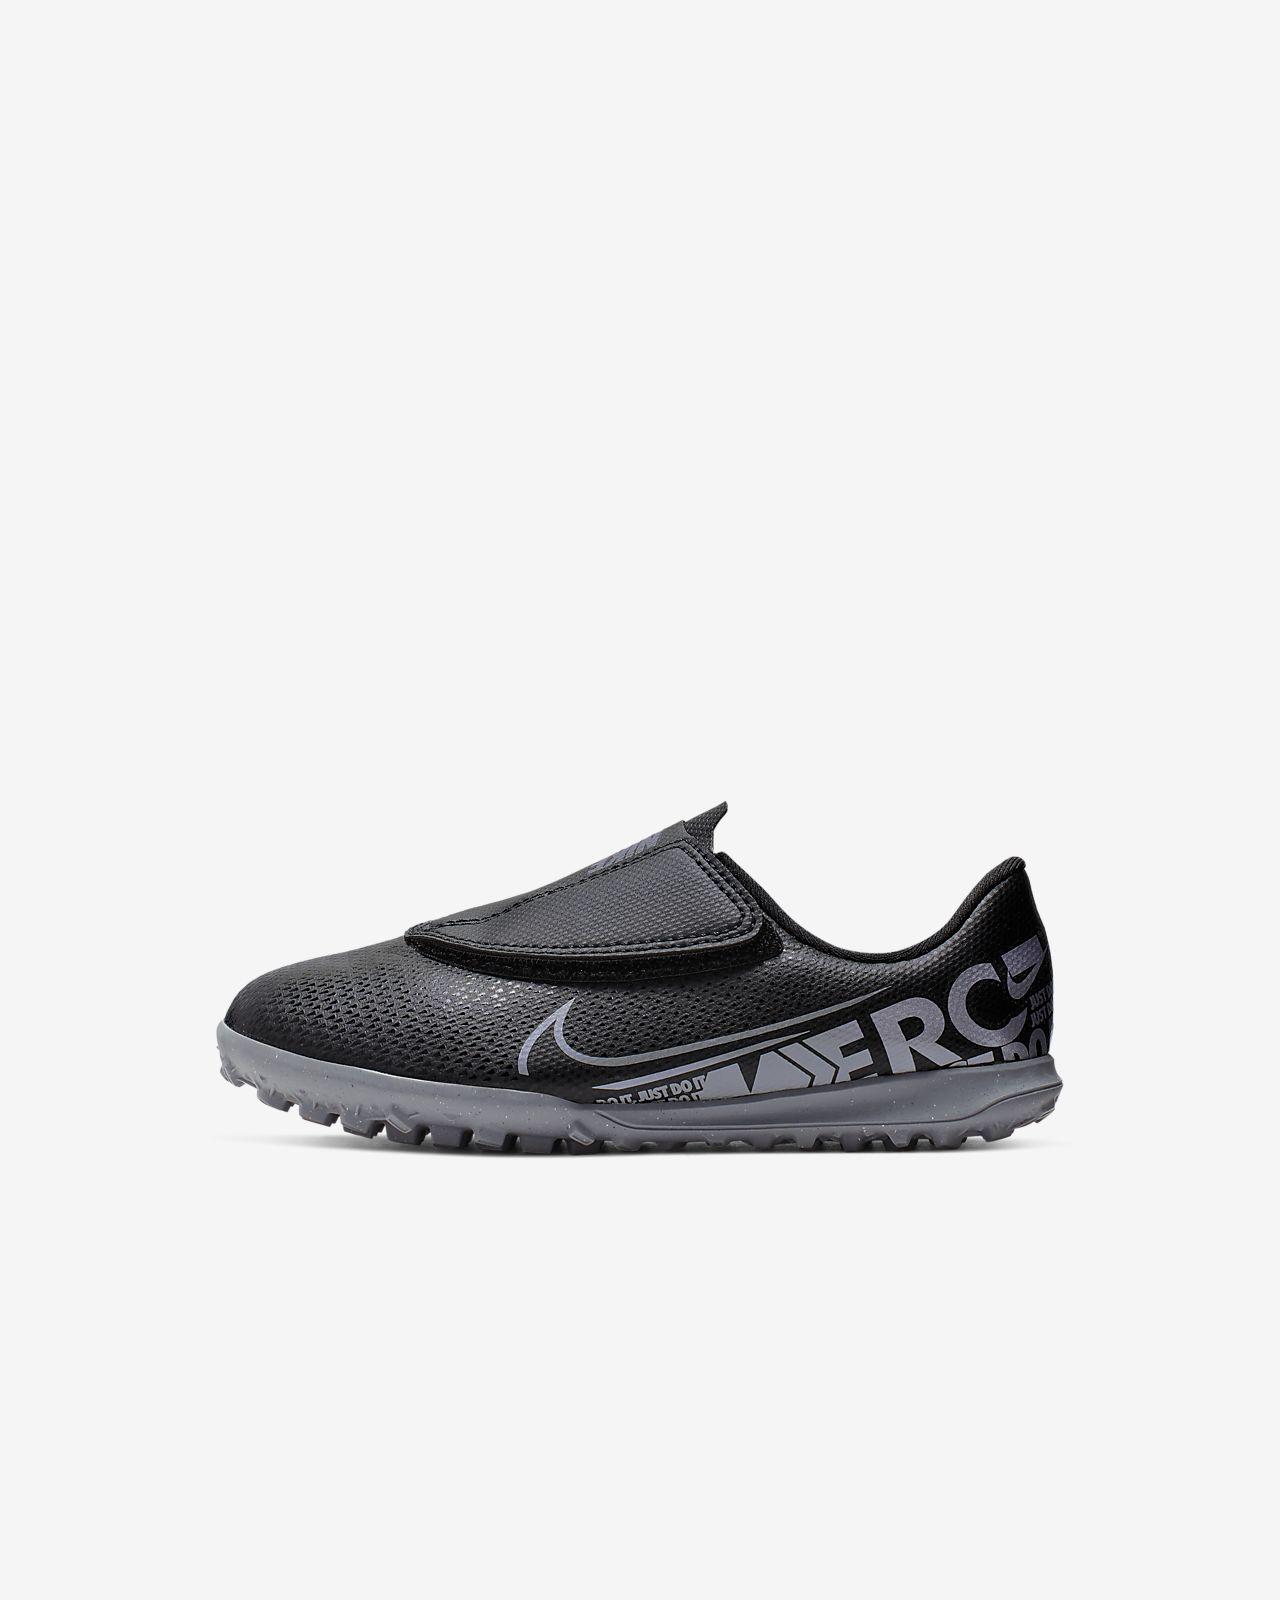 Kopačka Nike Jr. Mercurial Vapor 13 Club TF na umělou trávu pro batolata / malé děti